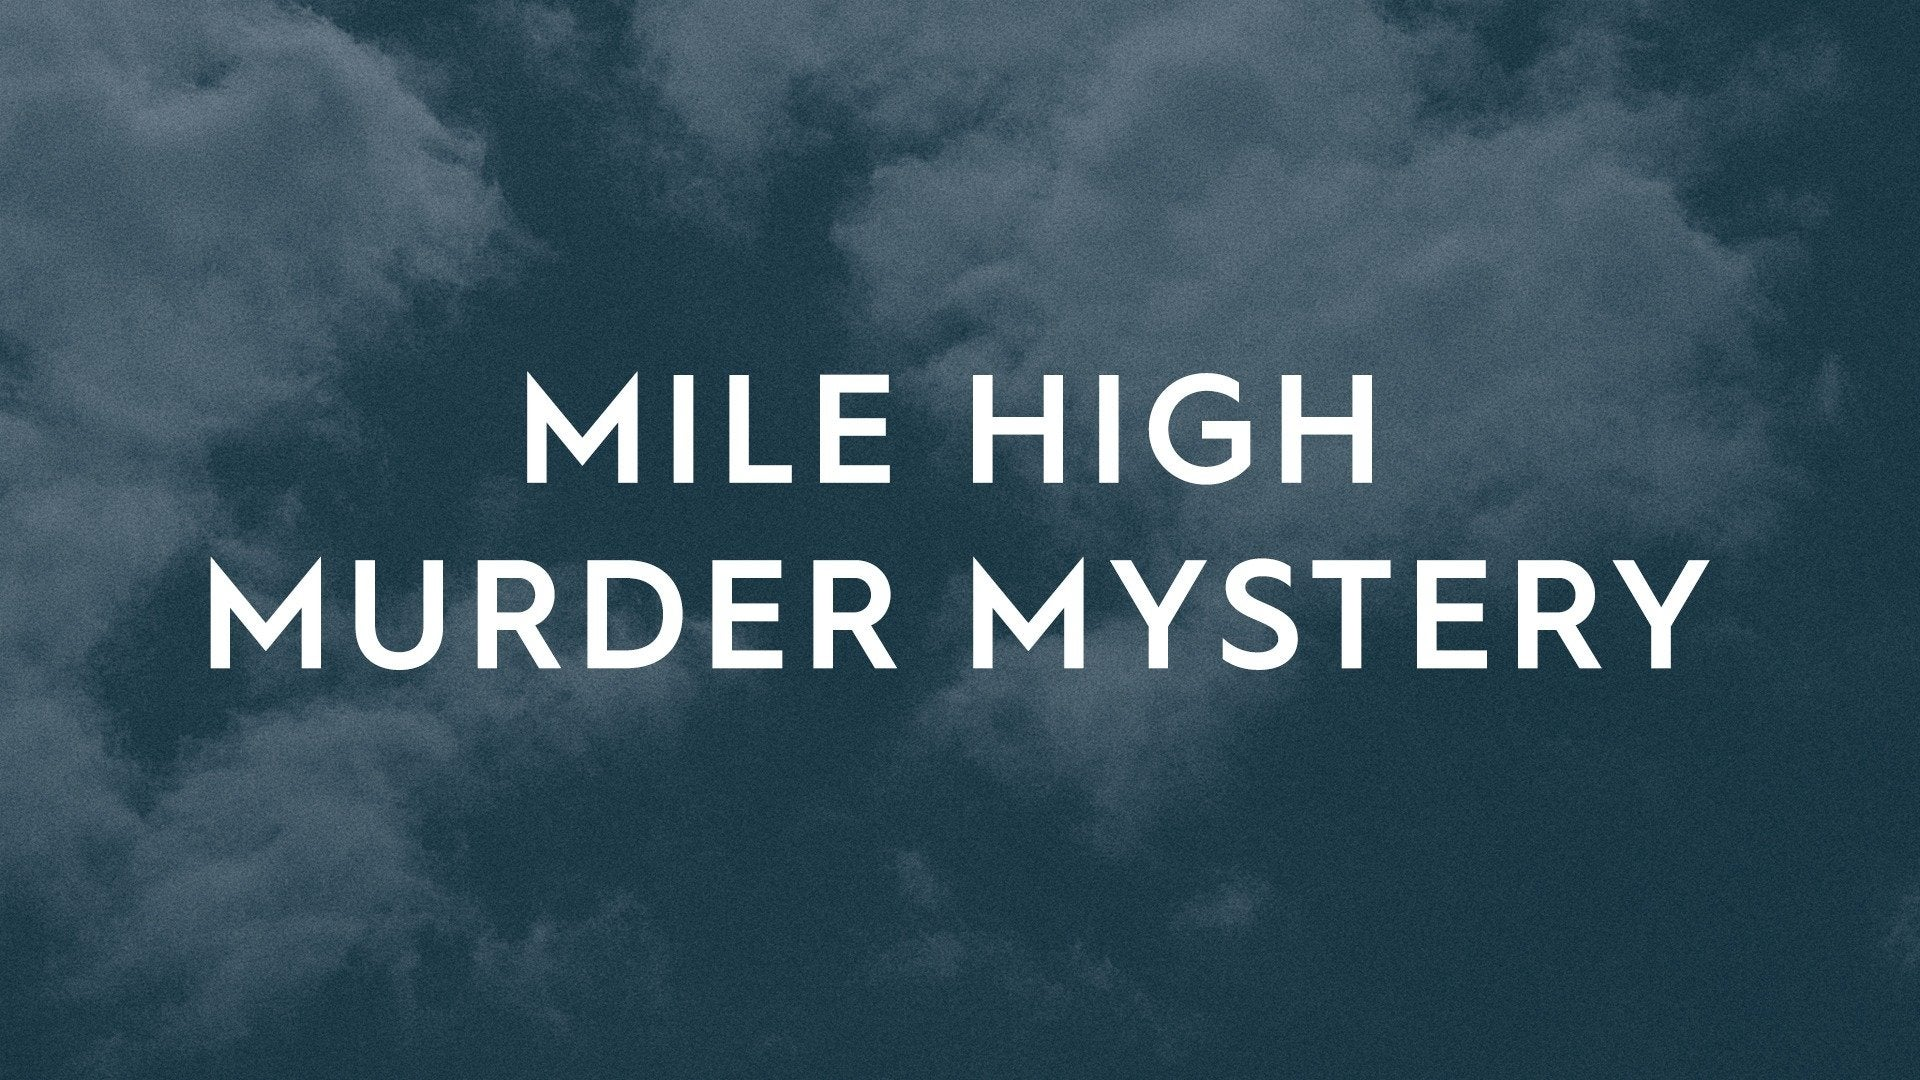 Mile High Murder Mystery